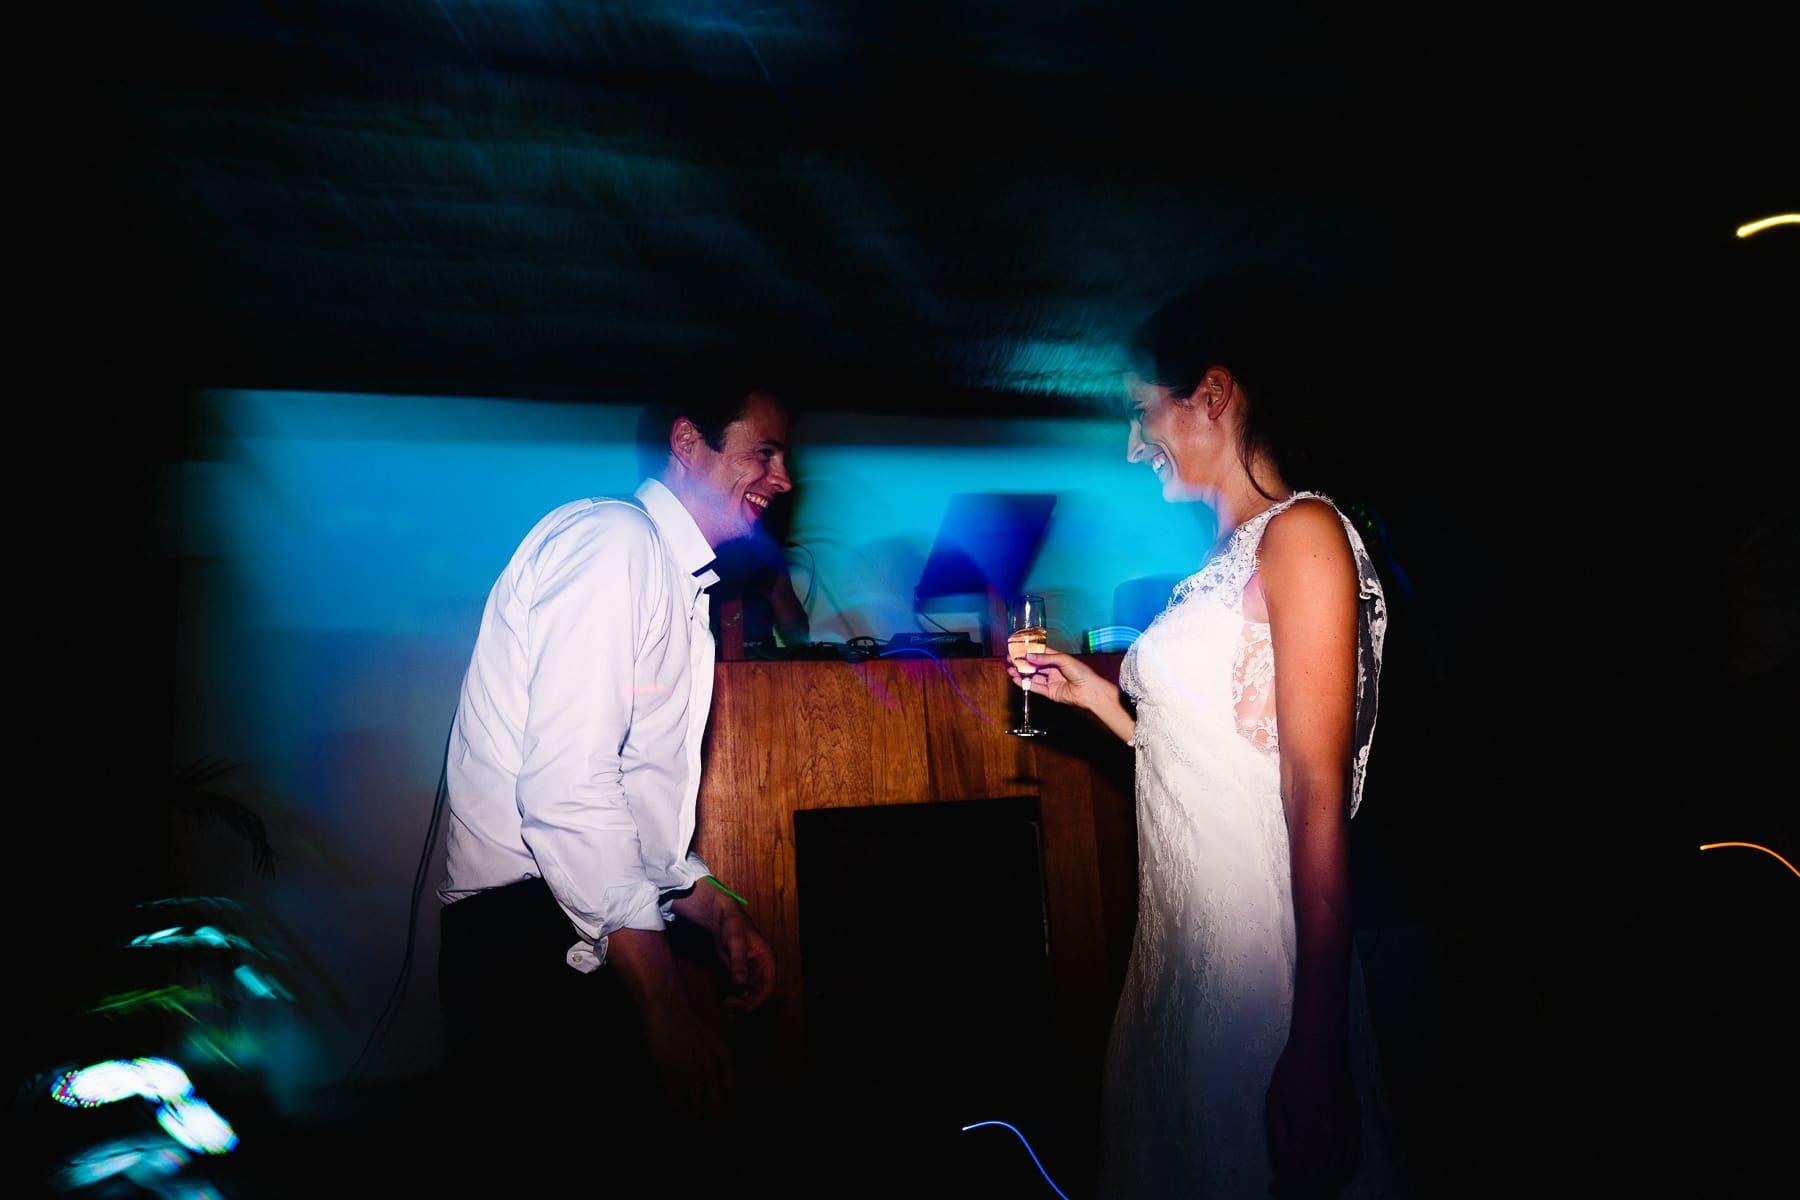 casamento francês no brasil